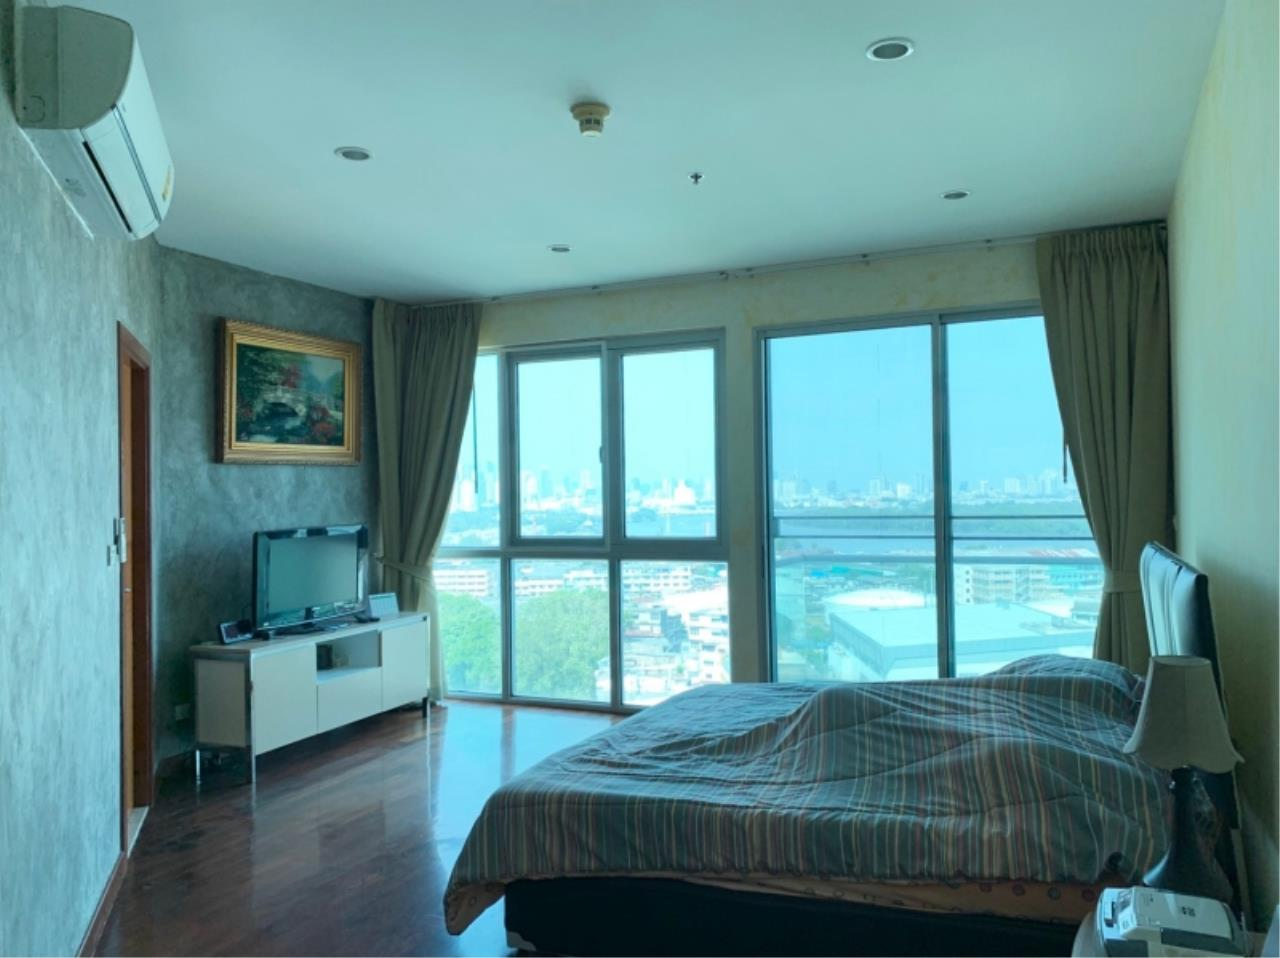 Century21 Skylux Agency's The Star Estate @ Narathiwas / Condo For Rent / 3 Bedroom / 165.09 SQM / BTS Chong Nonsi / Bangkok 4